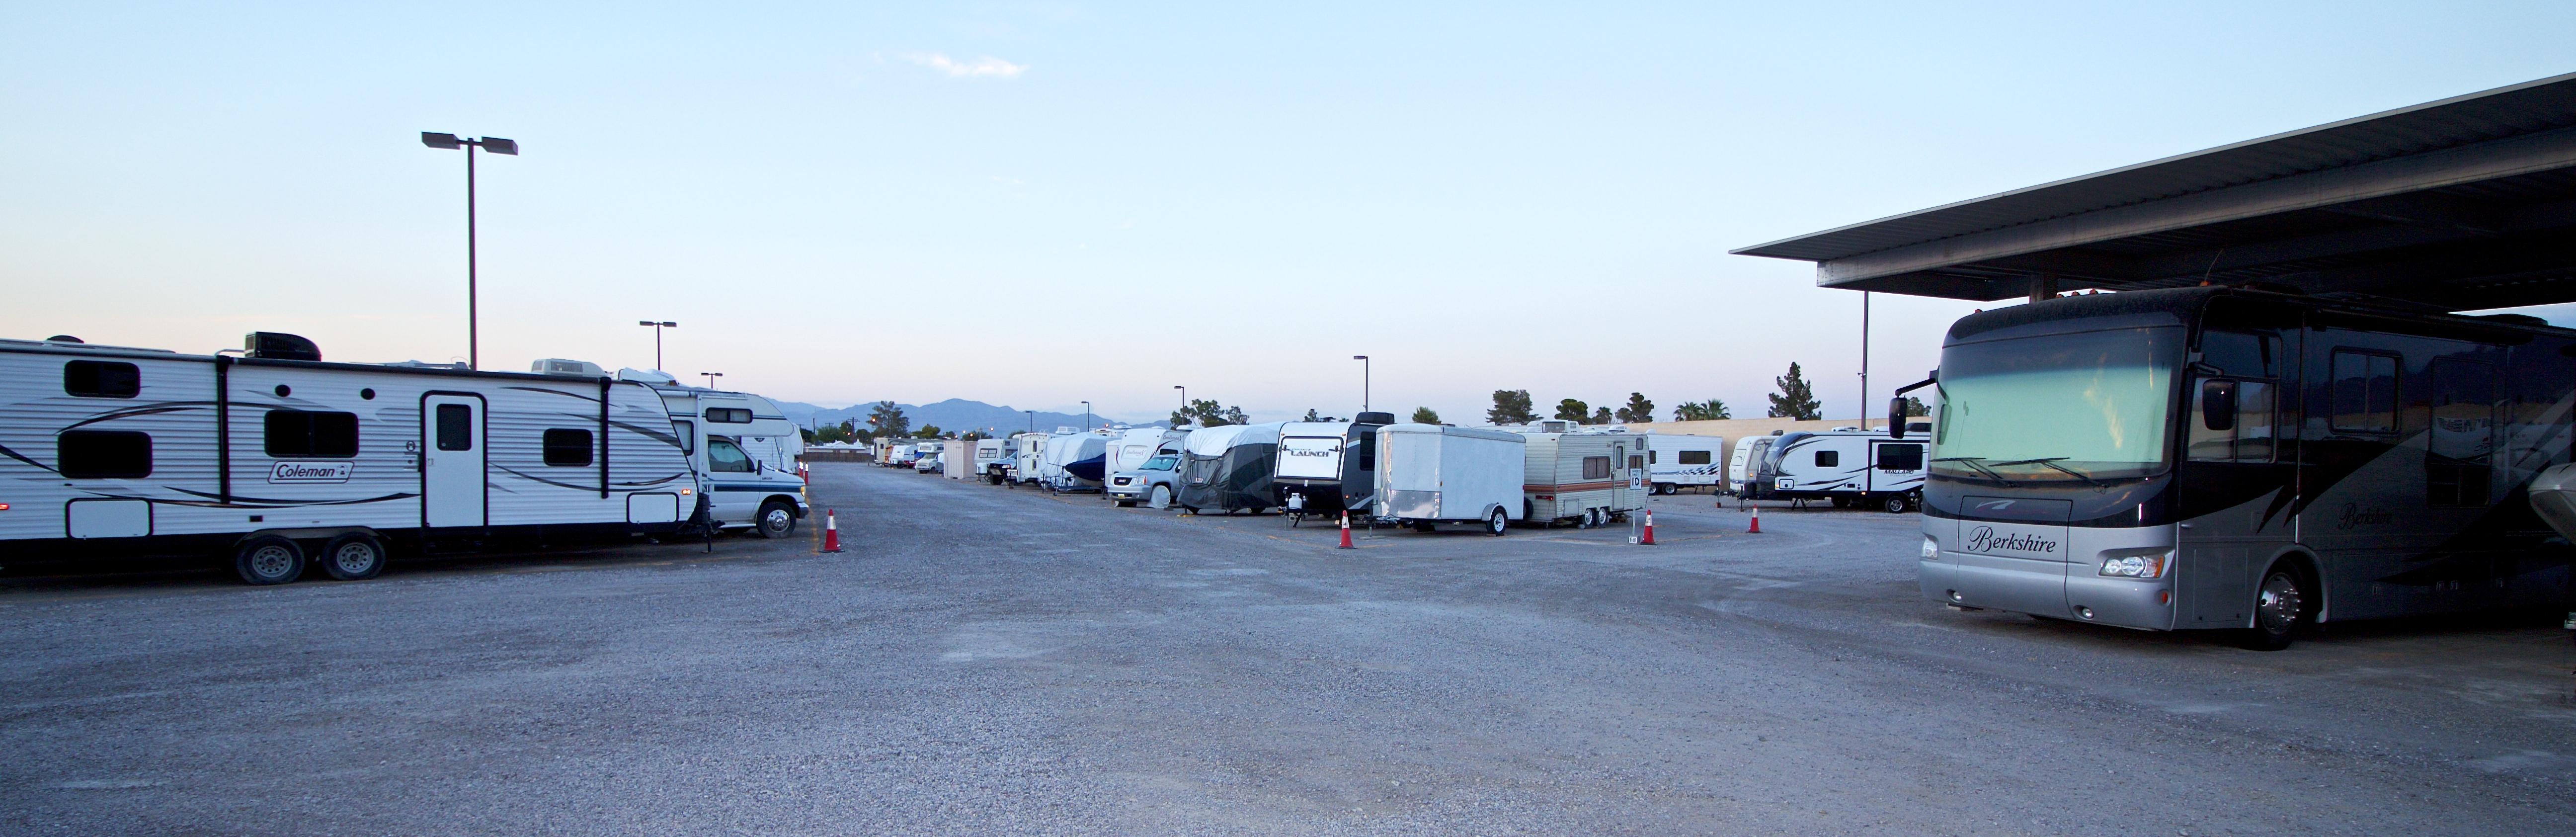 Maximum RV Storage - Lake Mead